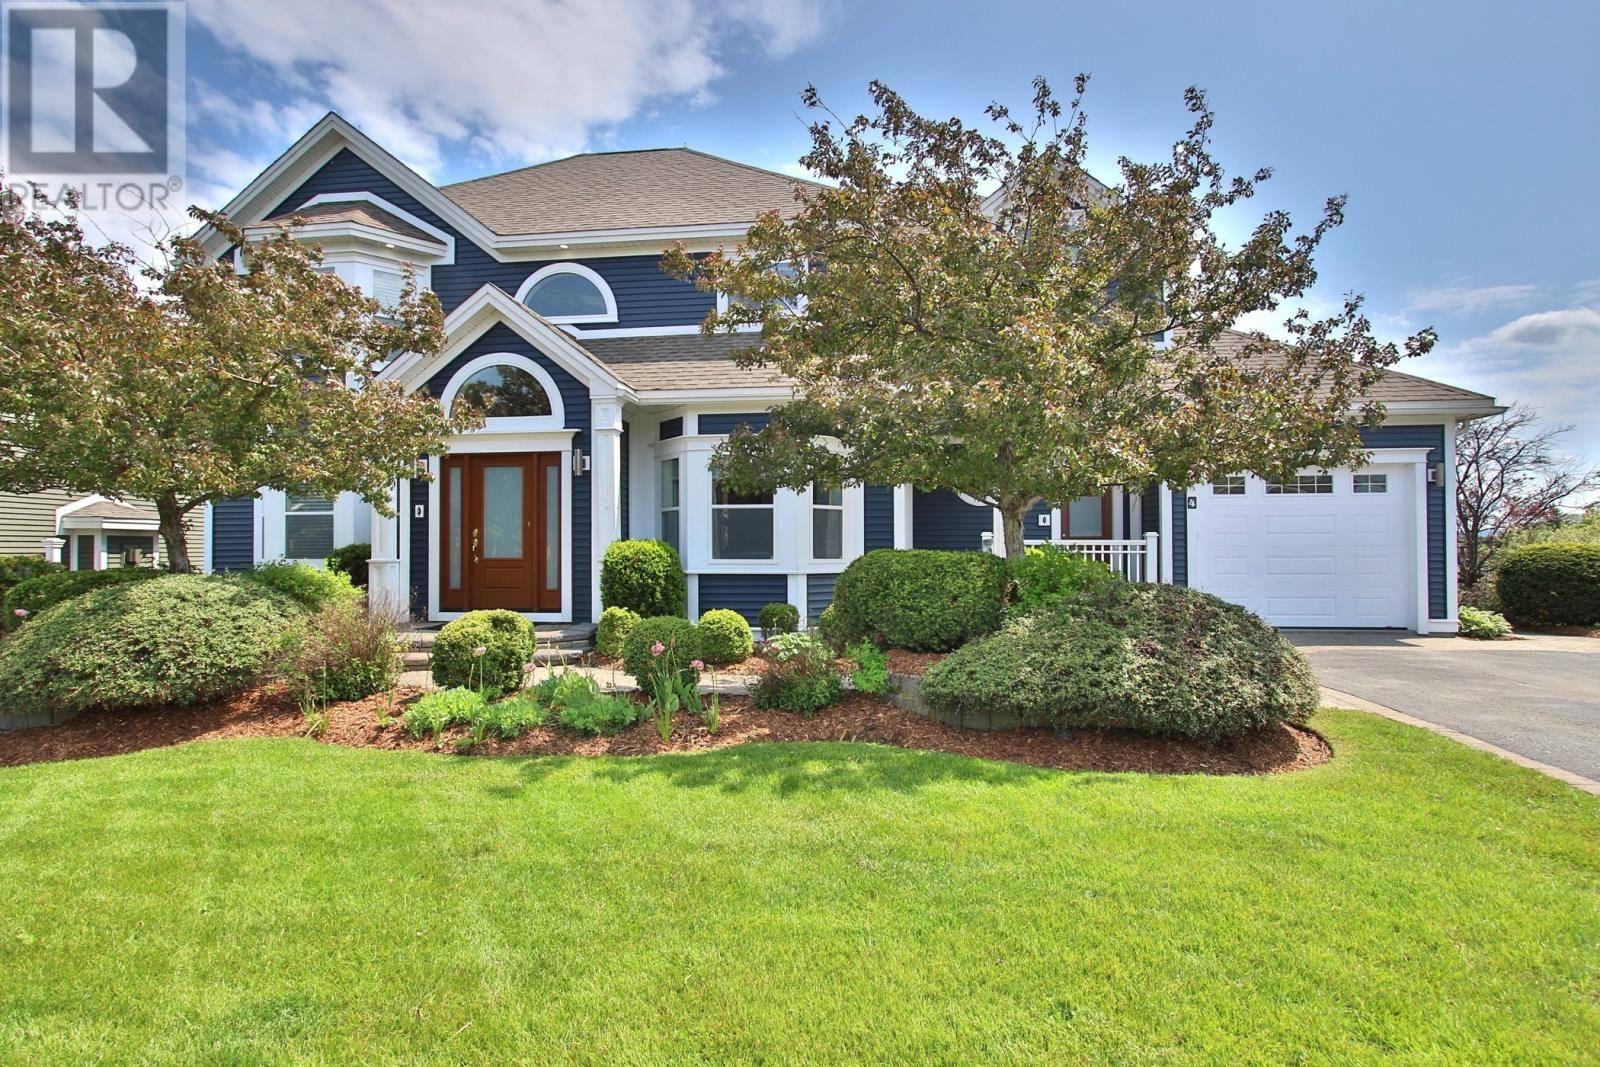 House for sale at 4 Cheyne Dr St. John's Newfoundland - MLS: 1199037